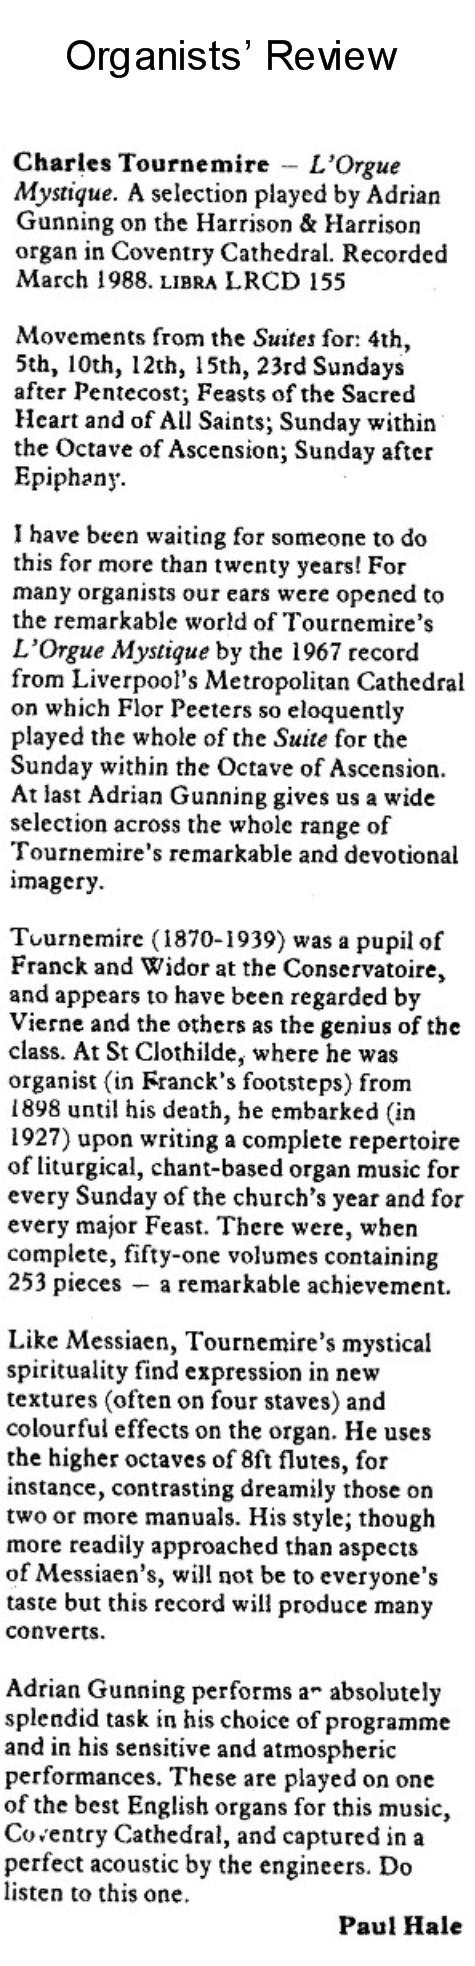 Adrian Gunning – Organist